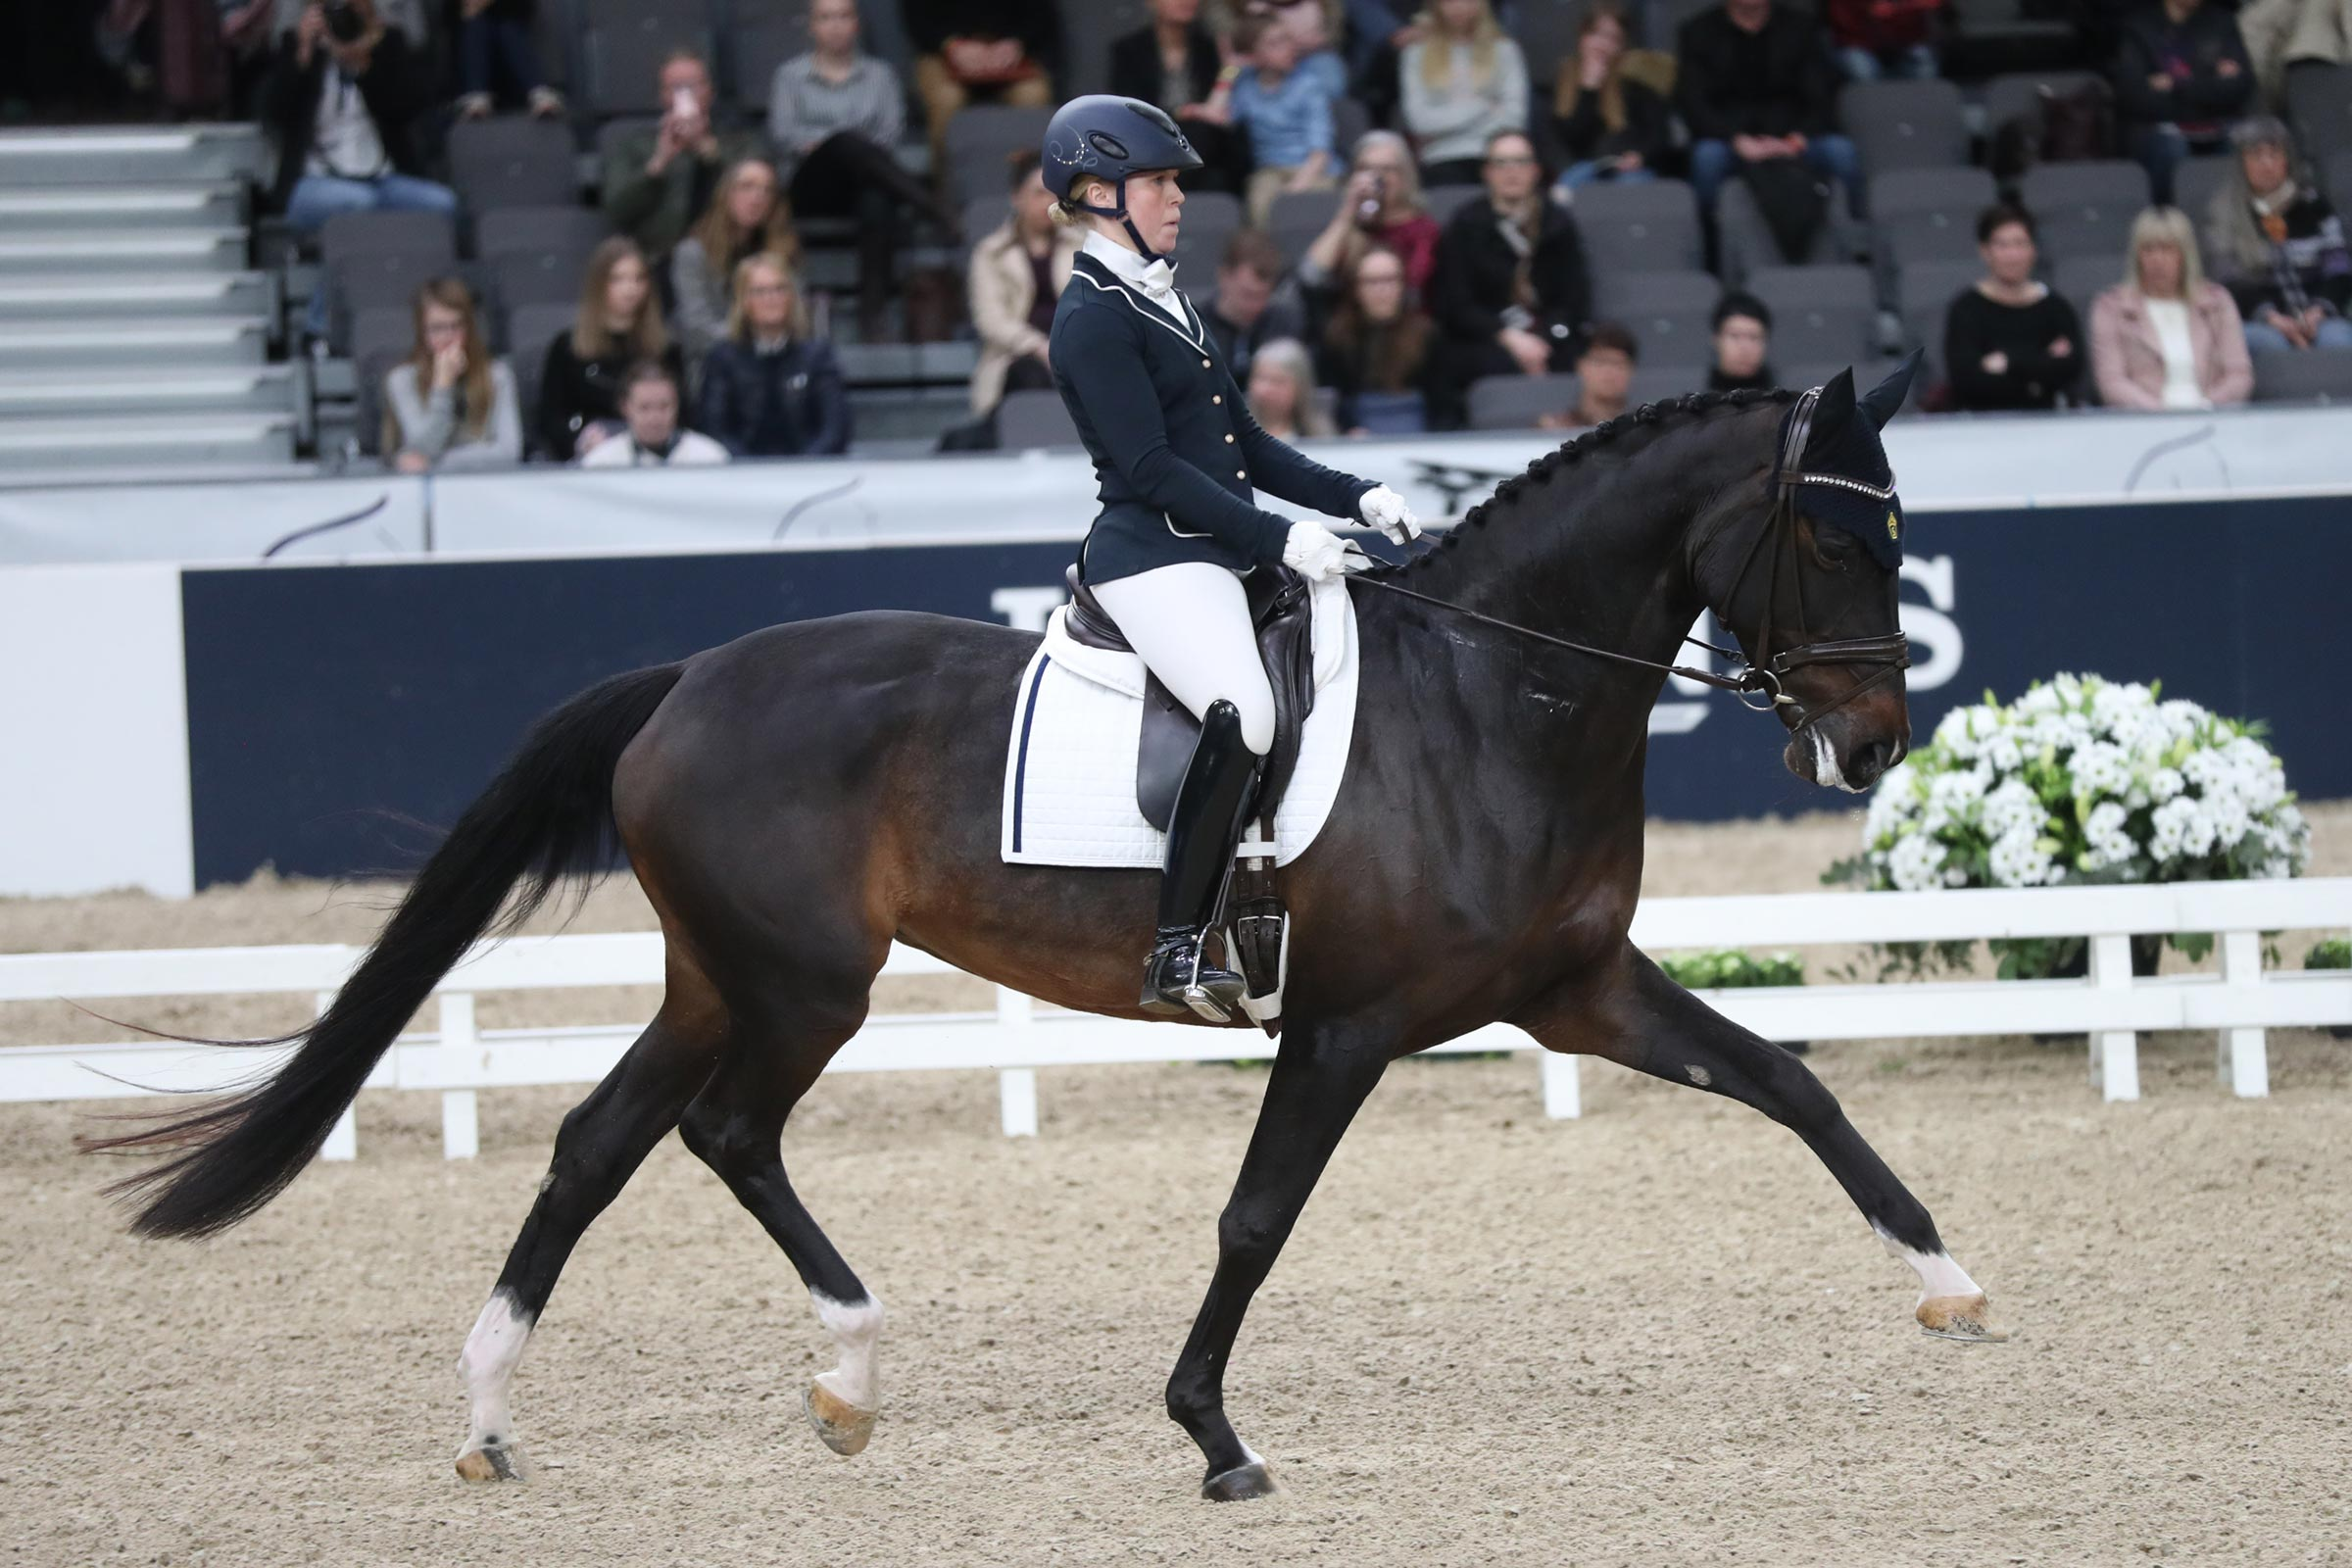 Yvonne Österholm - Hera (1) (SWB sto f-11 e Hohenstaufen II u Spira e Don Schufro, uppf Råbäcks Egendom AB) 83,2%